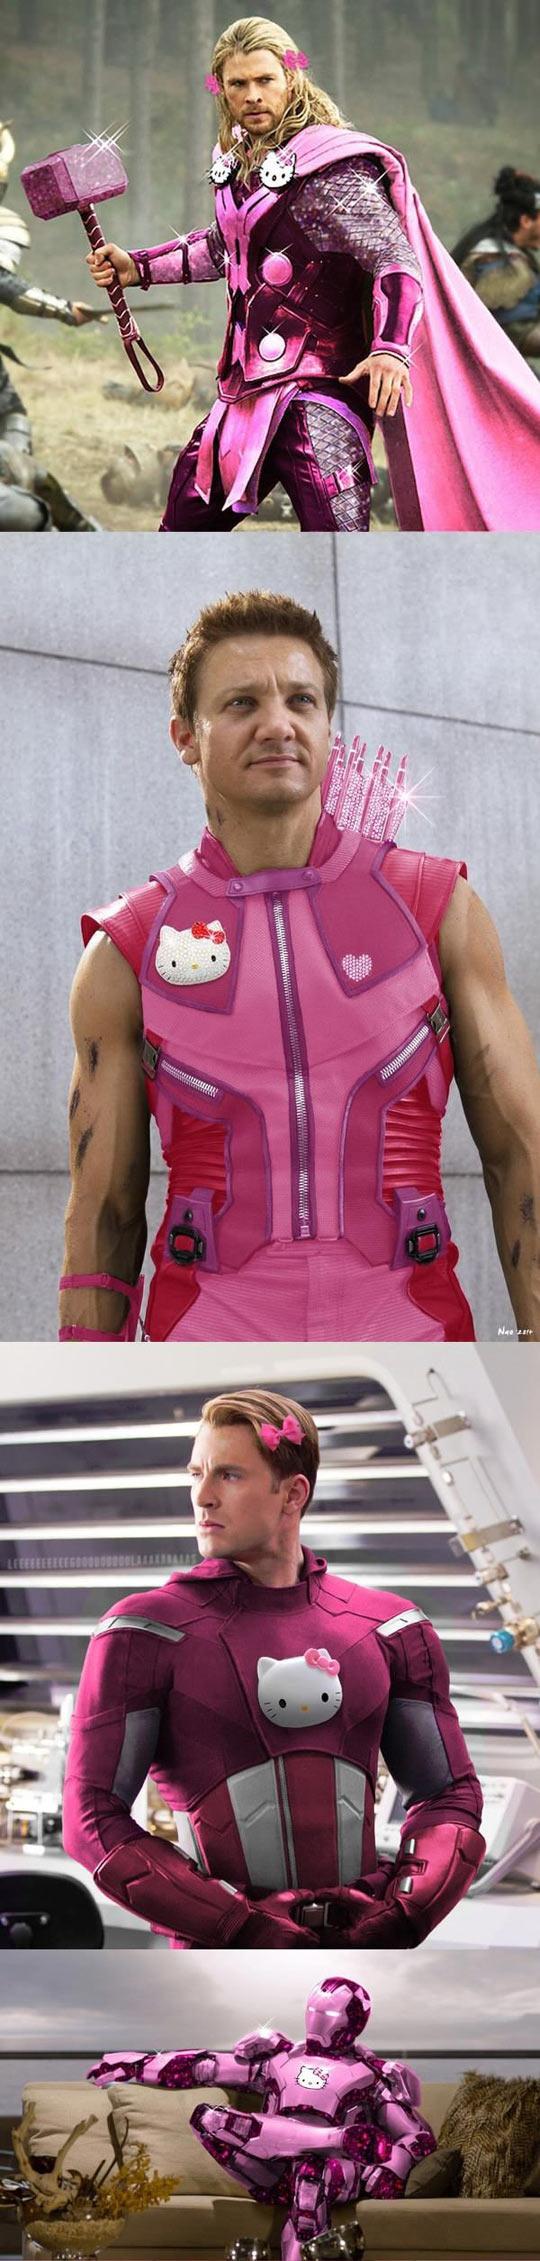 funny-hero-Hello-Kitty-costume